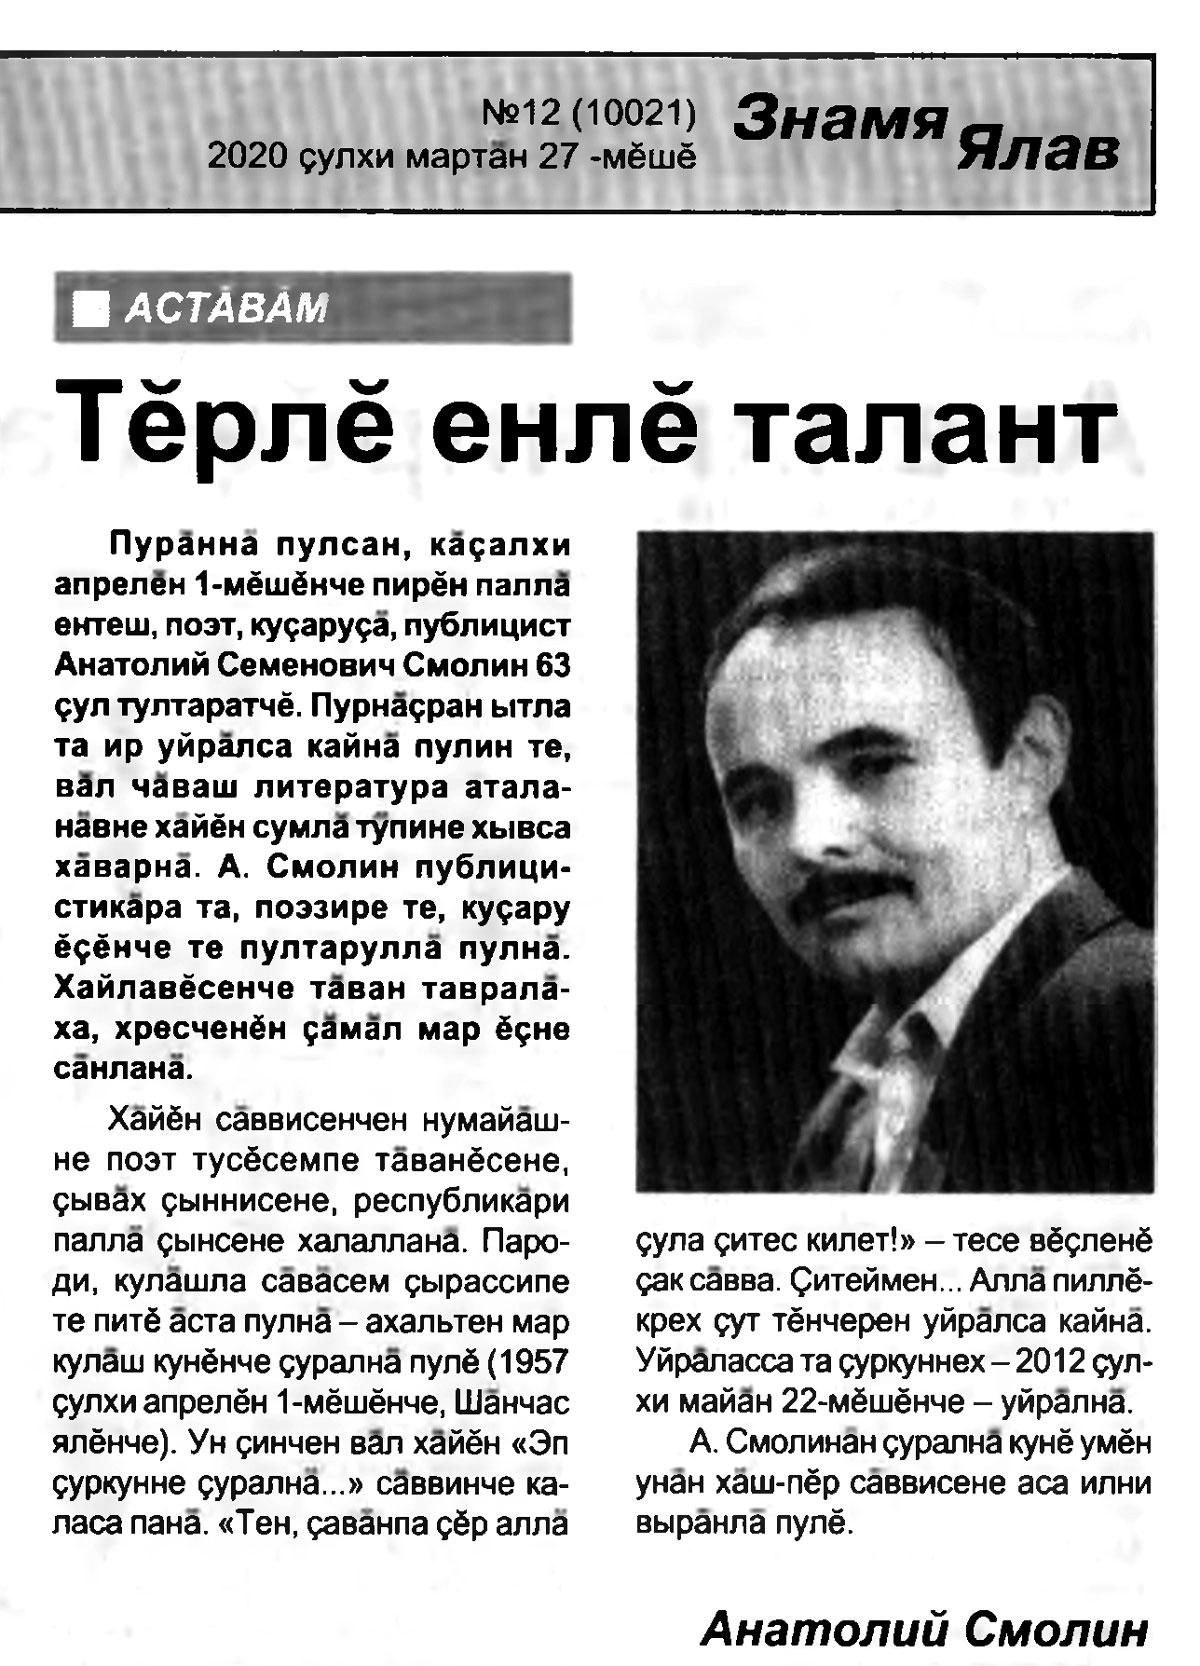 Read more about the article 1 апреля — день рождения А.С. Смолина (1957-2012)